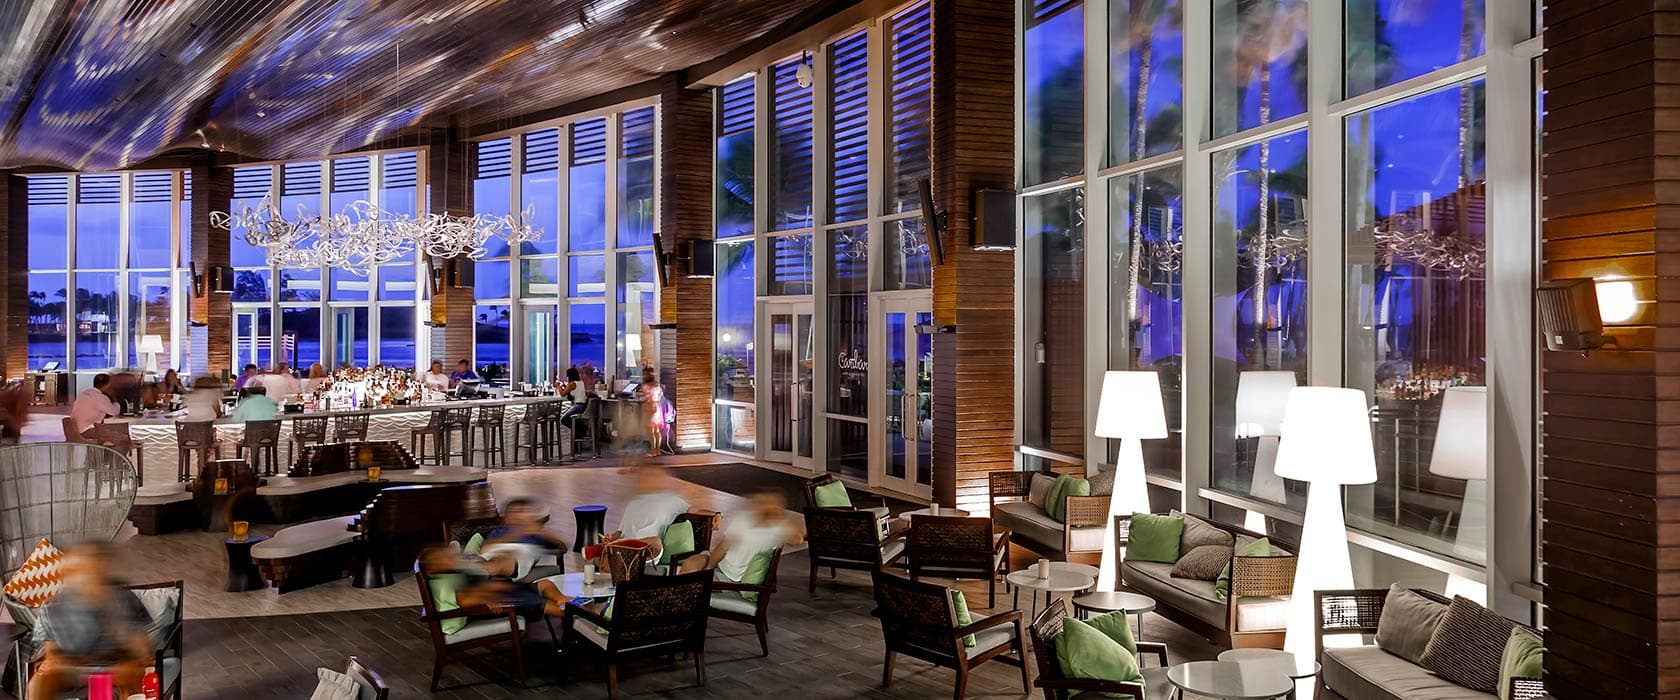 Caribe Hilton Restaurants Bars San Juan Puerto Rico